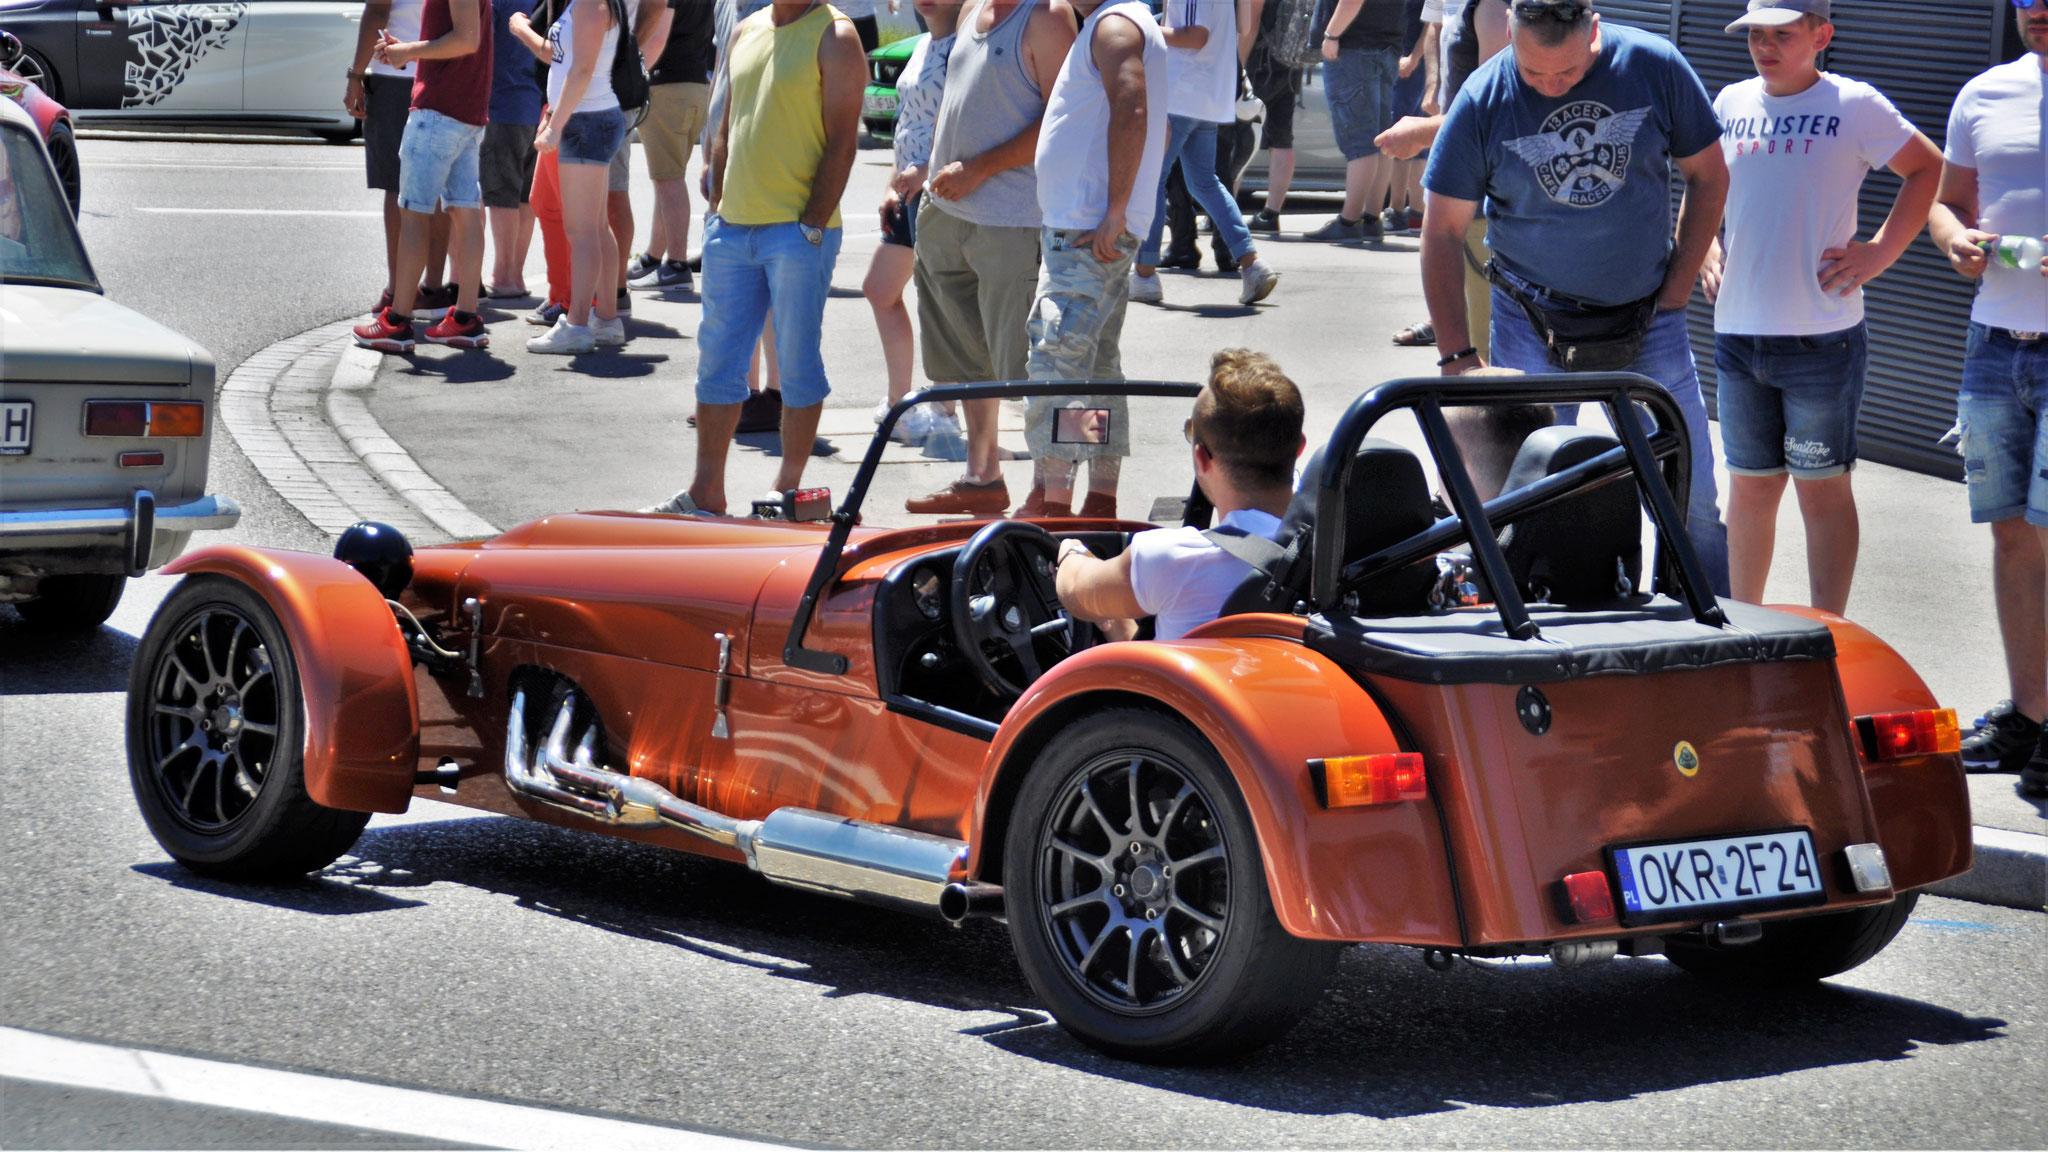 Lotus 7 - OKR-2F24 (POL)